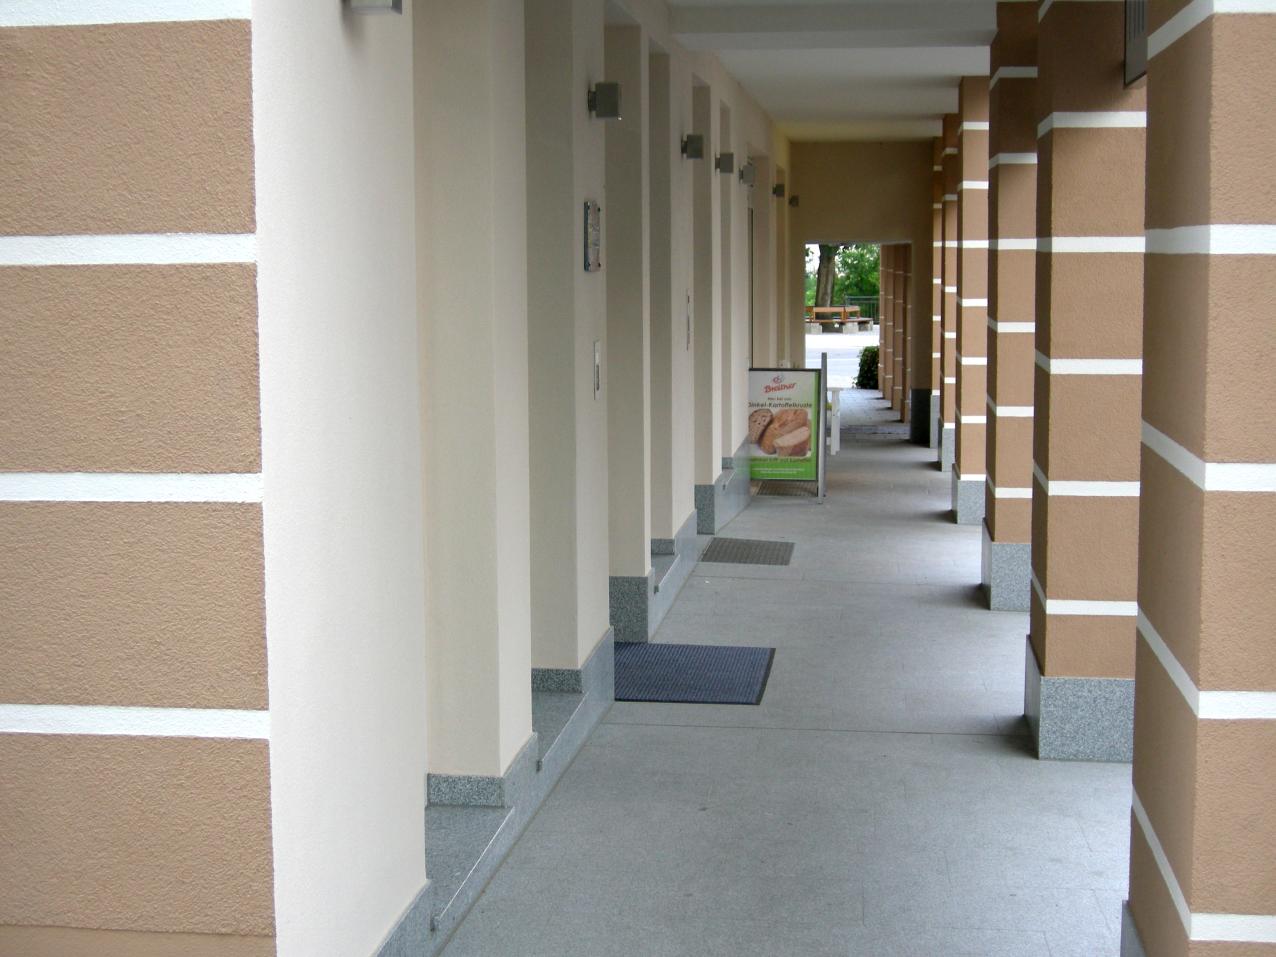 klosterstrasse2a_02